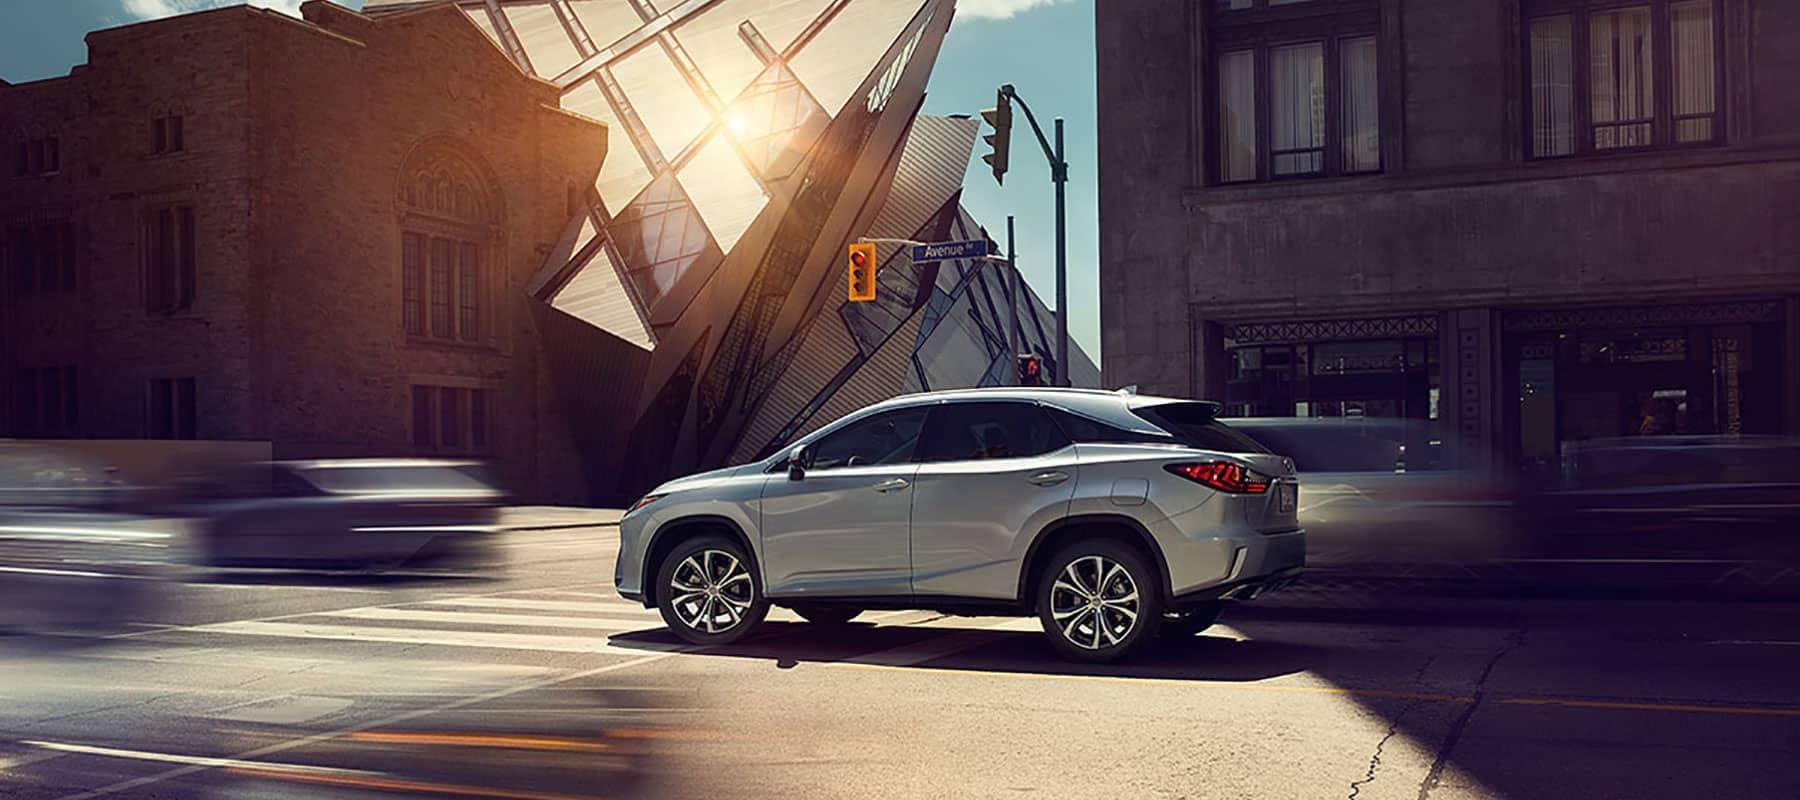 Lexus-RX-350-silver-lining-metallic-gallery-overlay-1204x677-LEXRXGMY160041